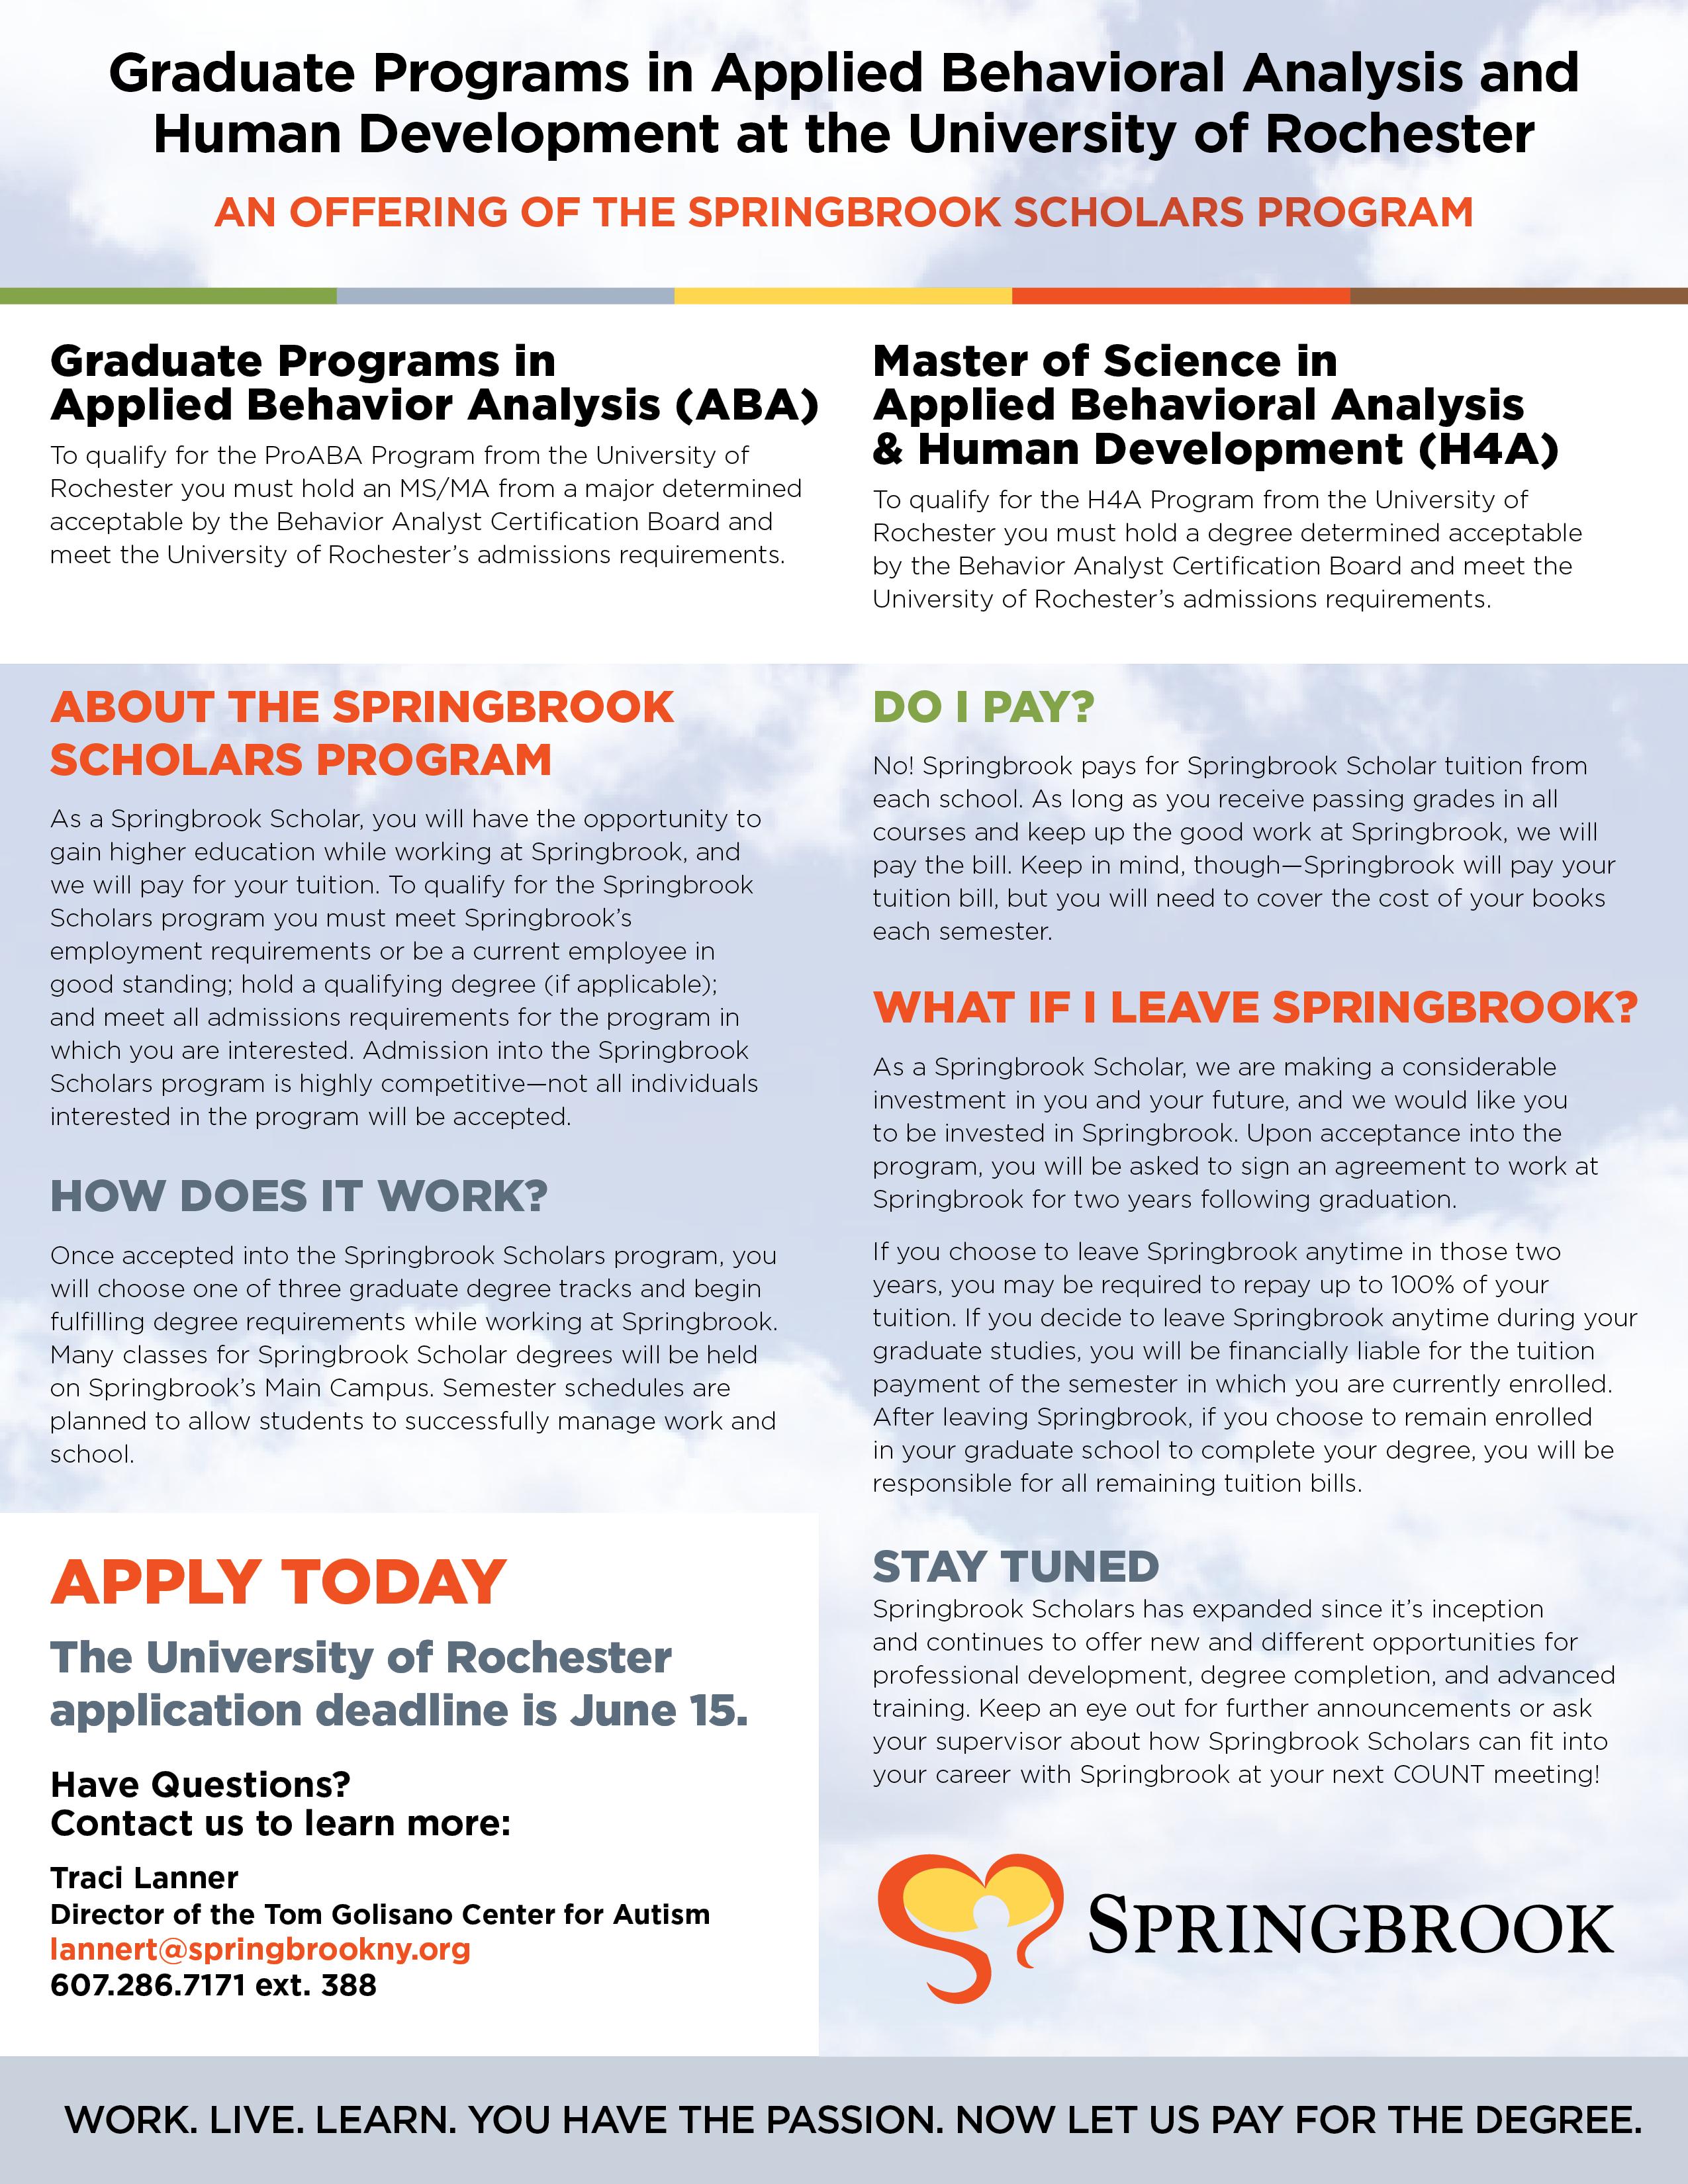 2019 SpringbrookScholars Rochester Programs - Springbrook Scholars - Rochester Graduate Programs